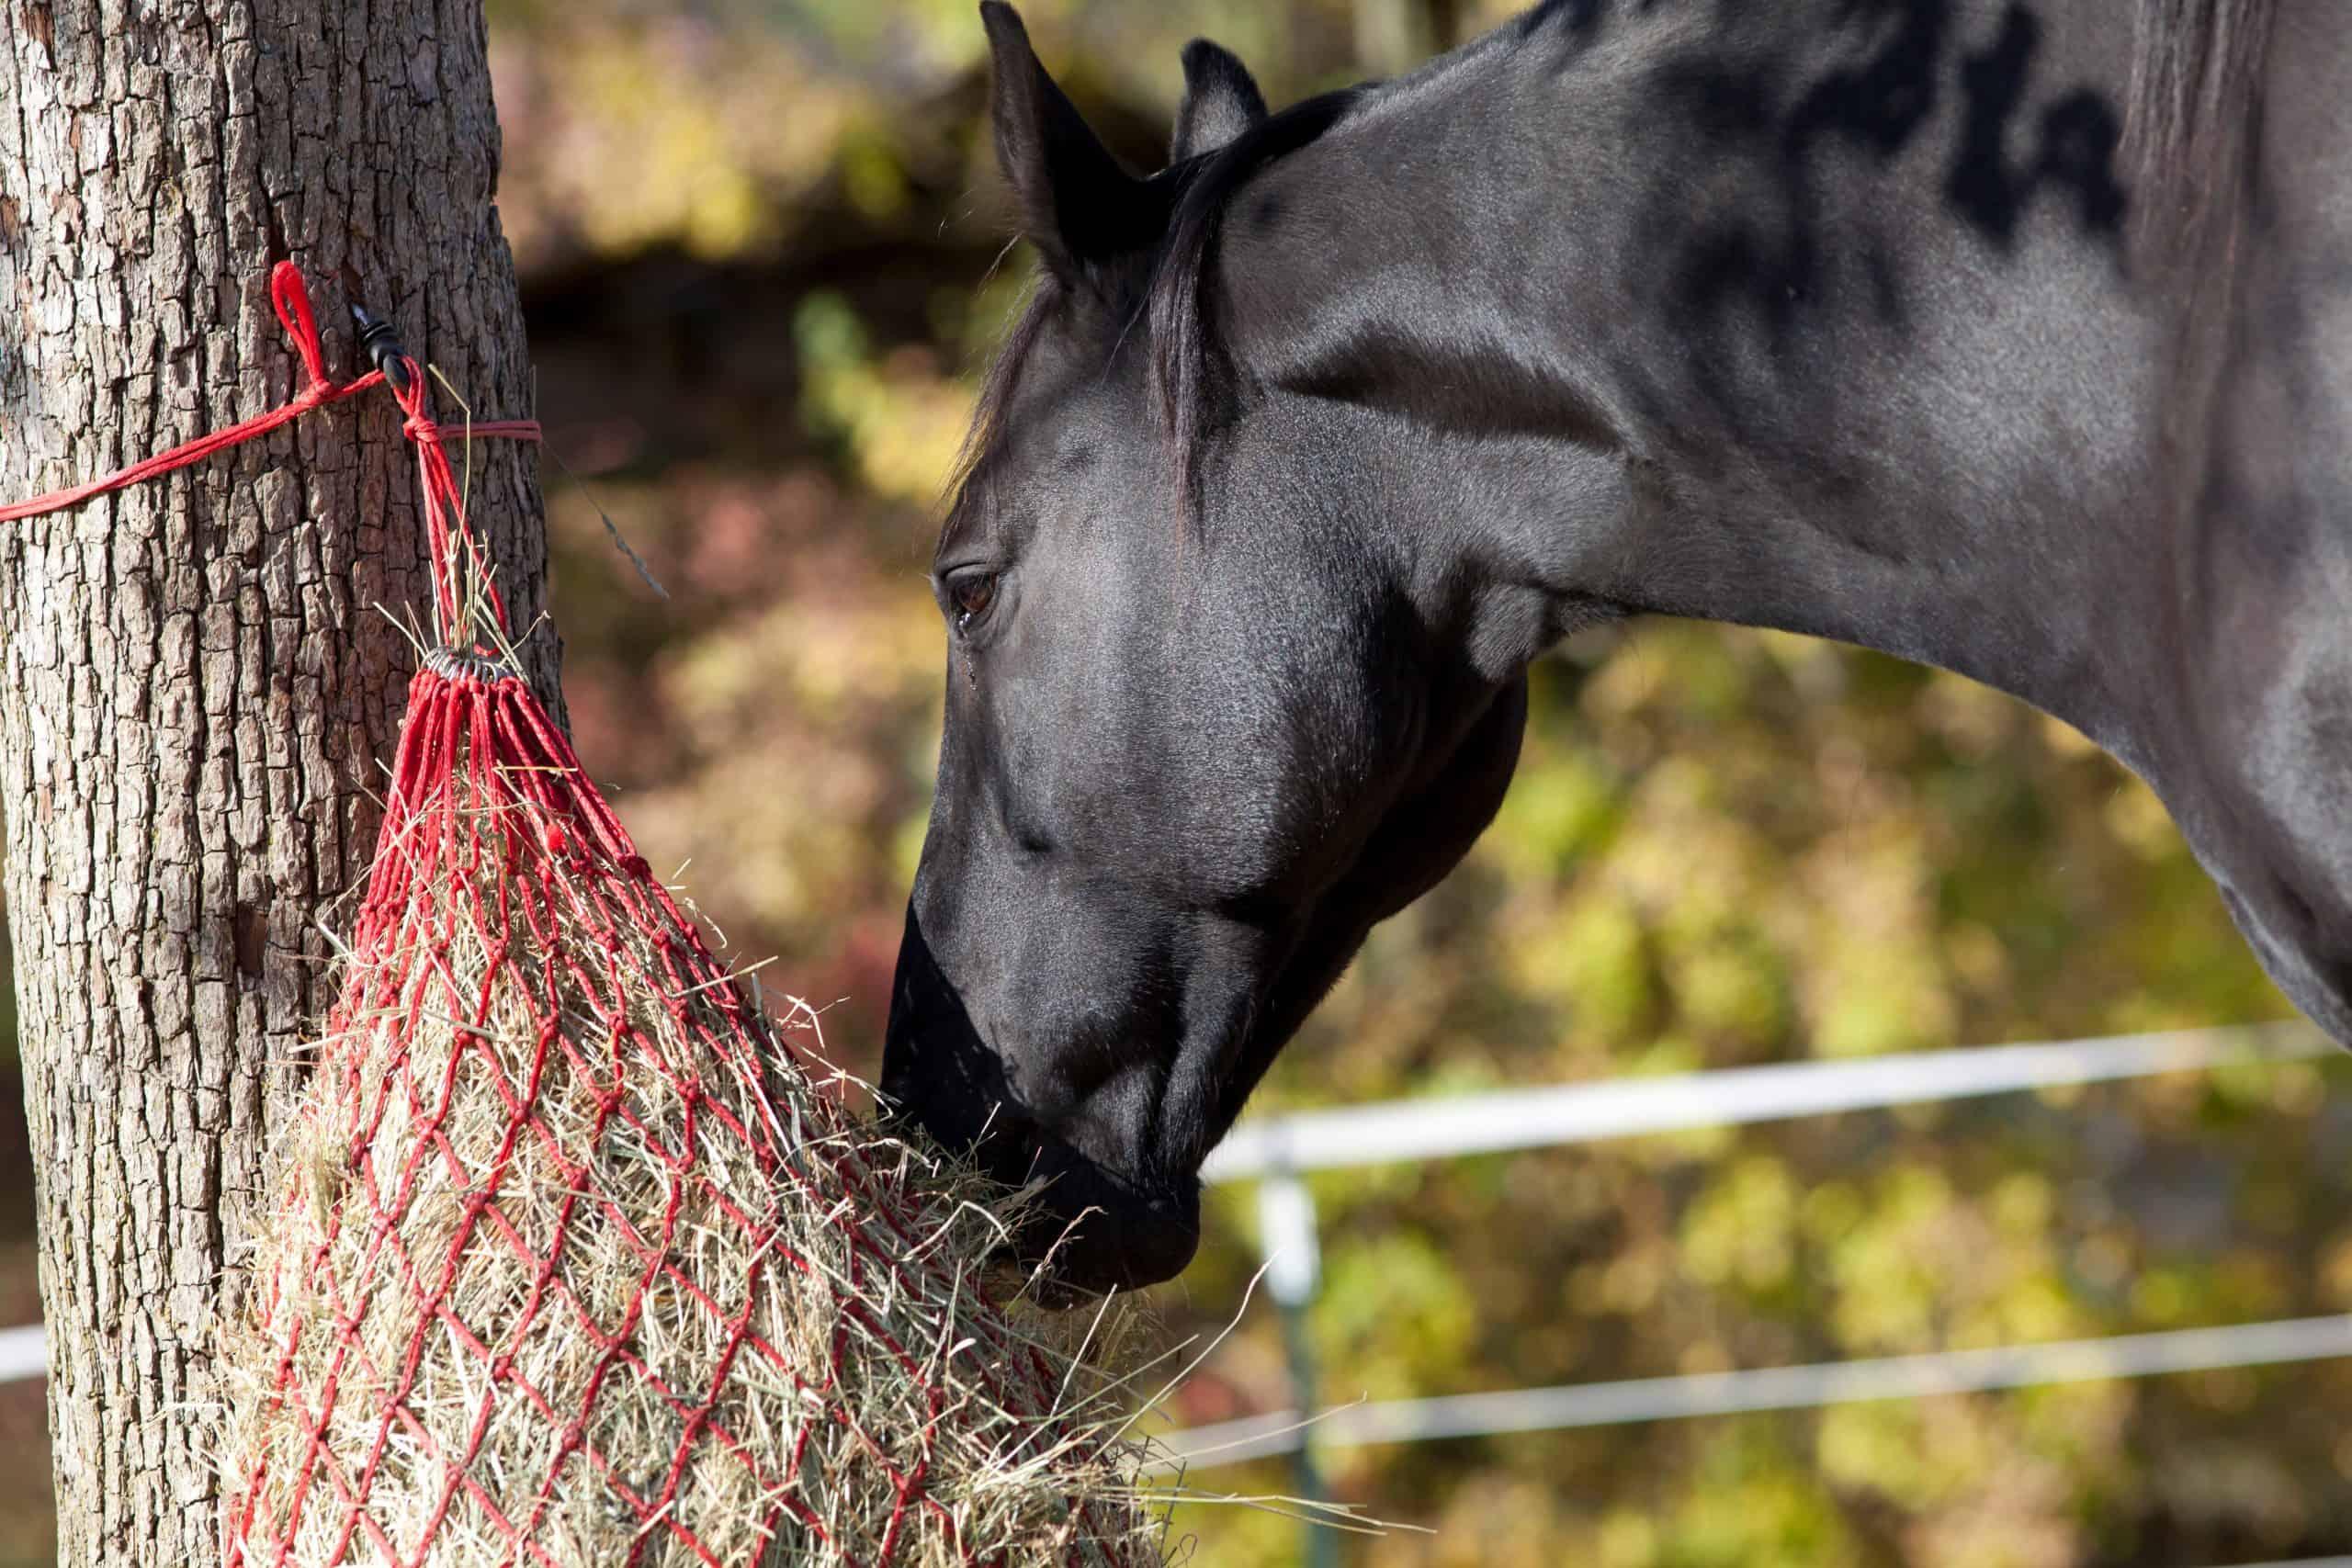 Horse feeding with hay net